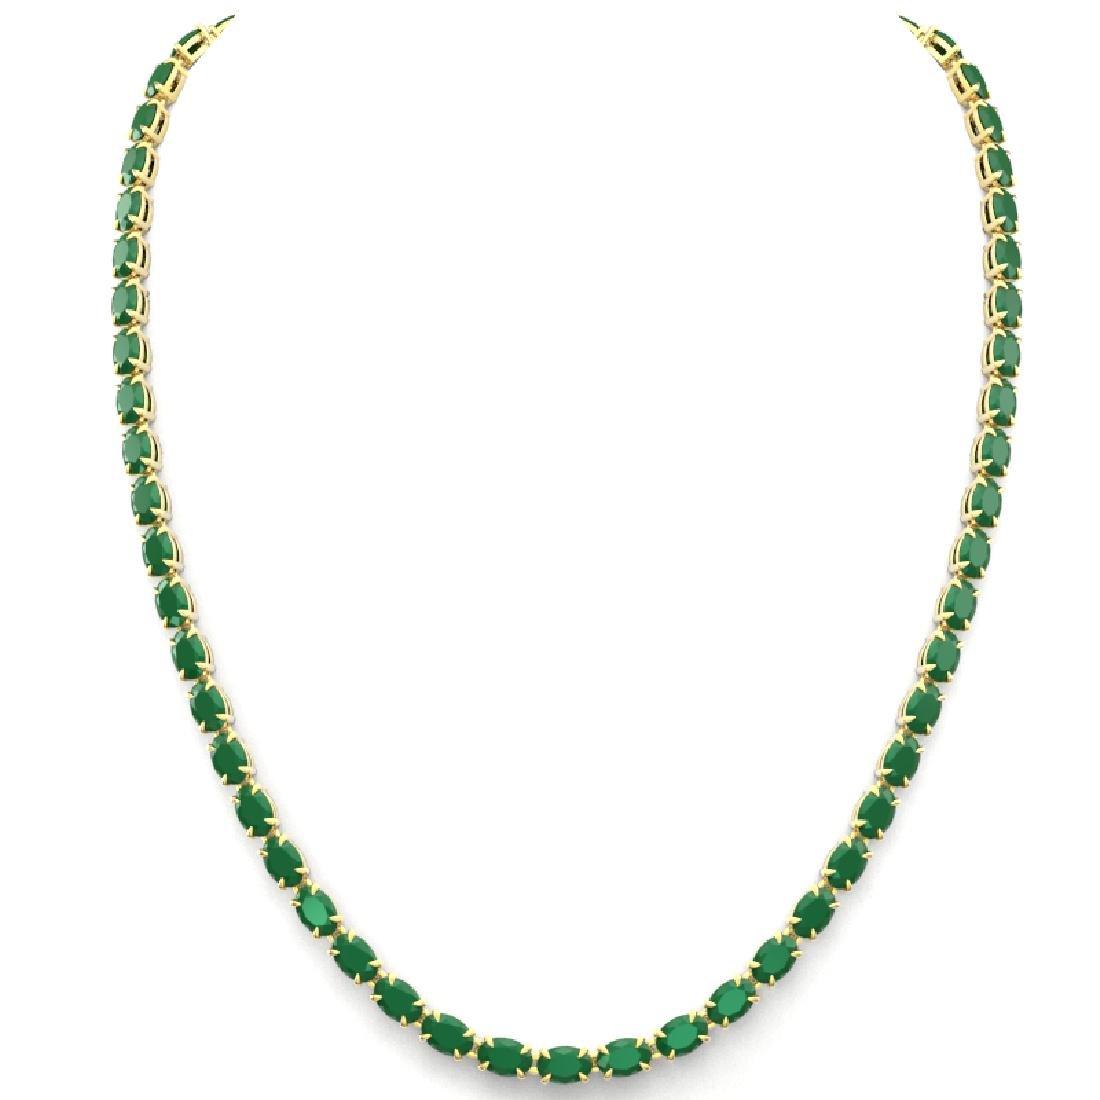 40 CTW Emerald Eternity Tennis Necklace 14K Yellow Gold - 3